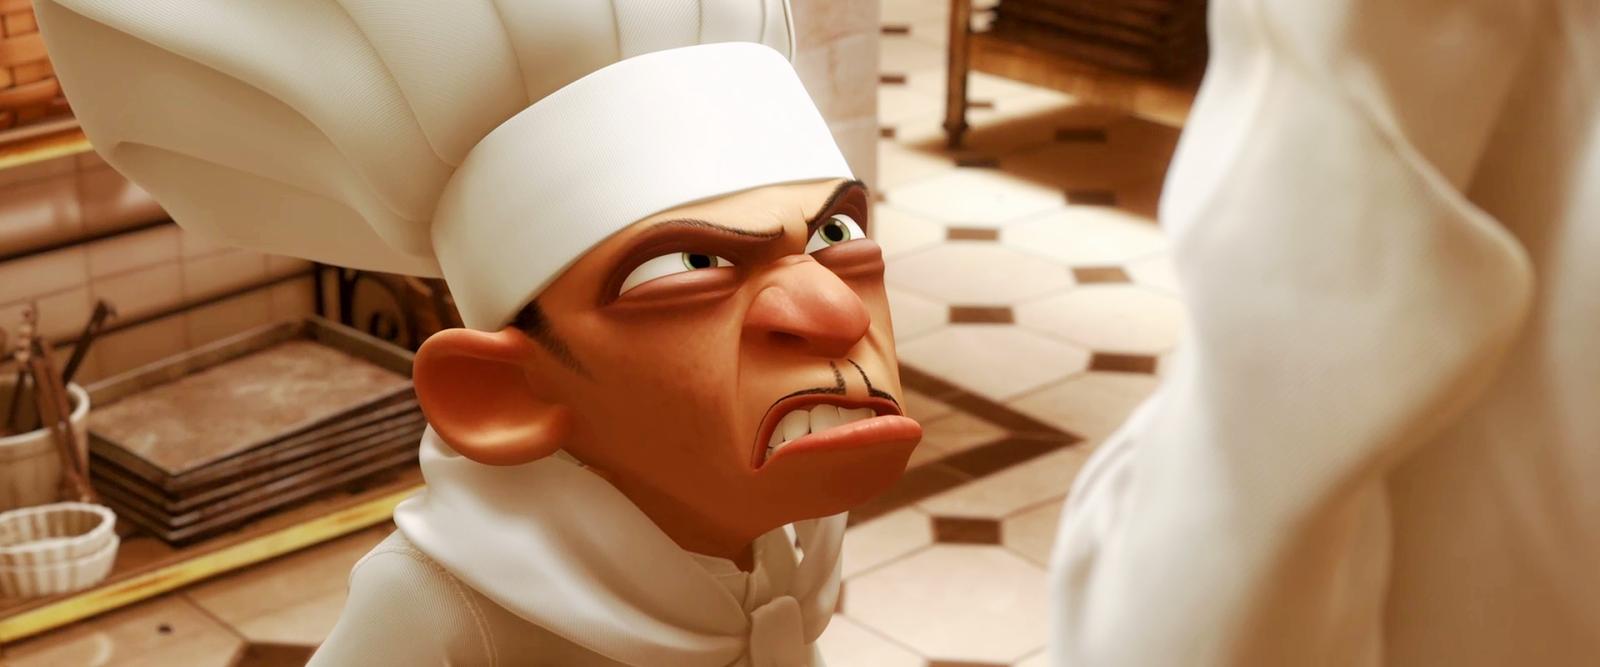 Year of the Villain: Chef Skinner